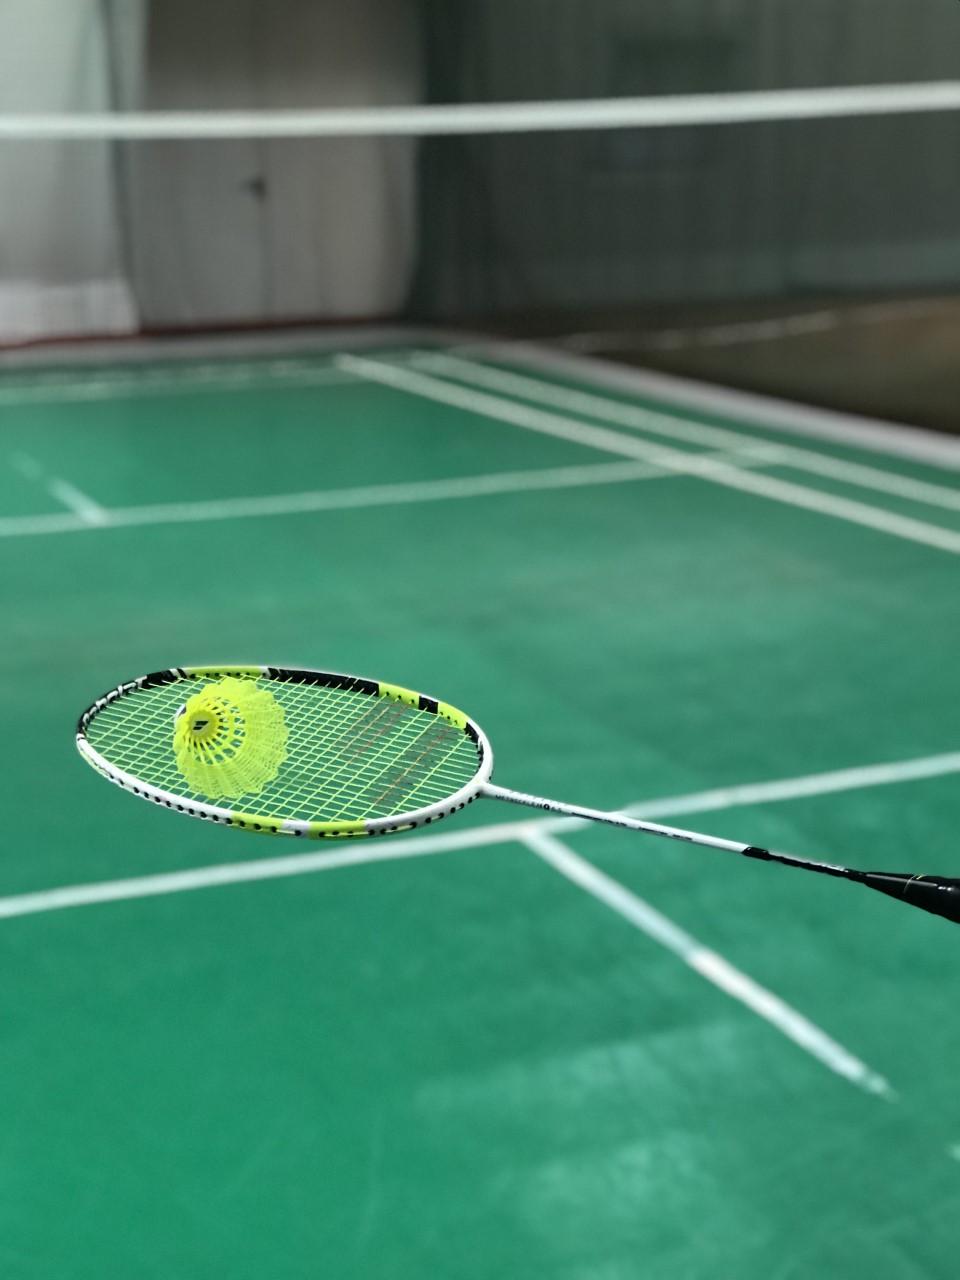 badminton igrišče, lopar in žoga